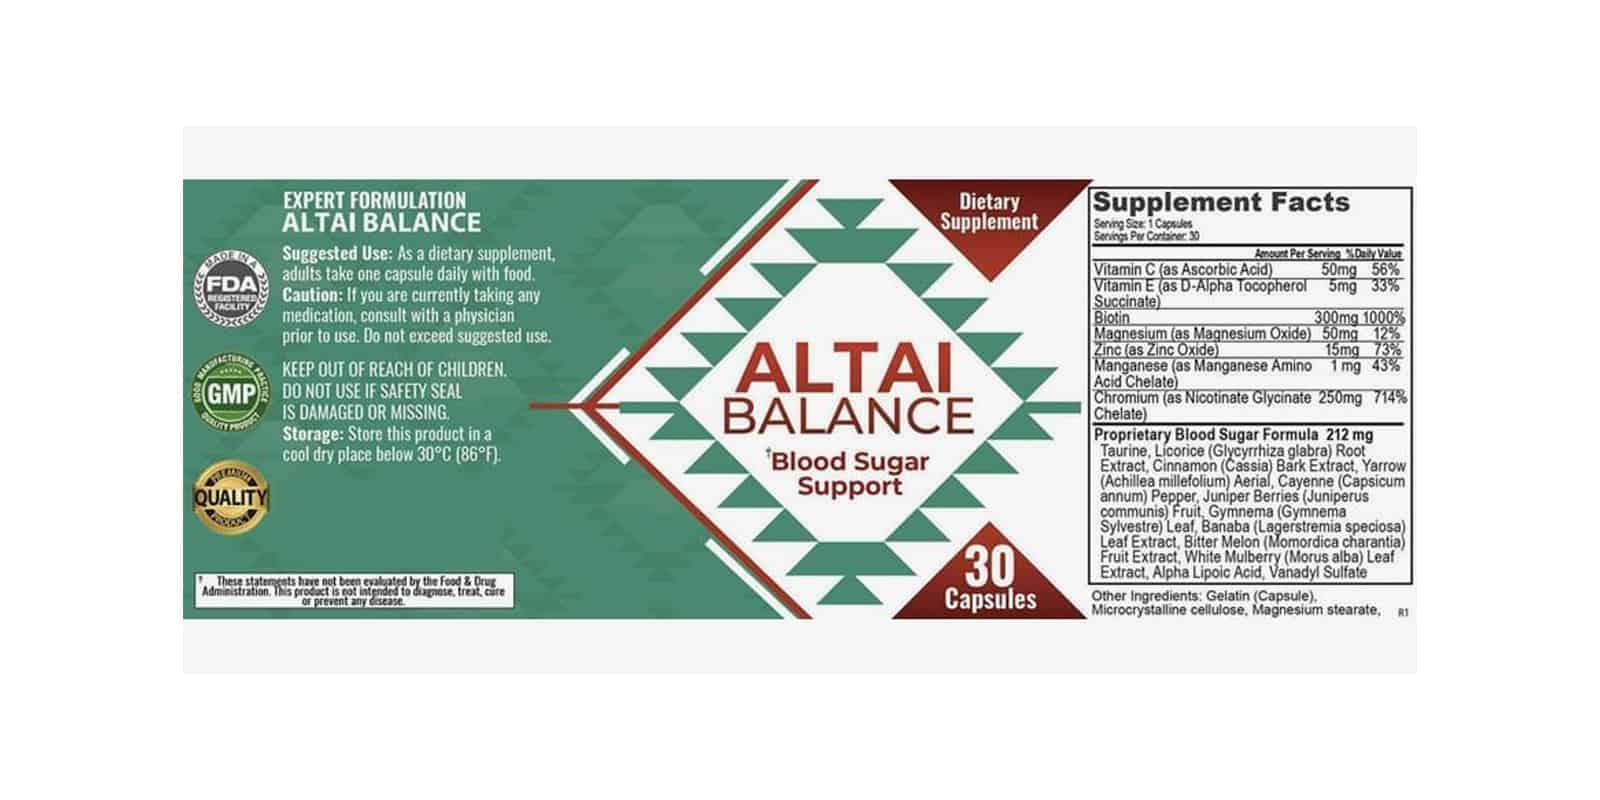 Altai Balance Dosage